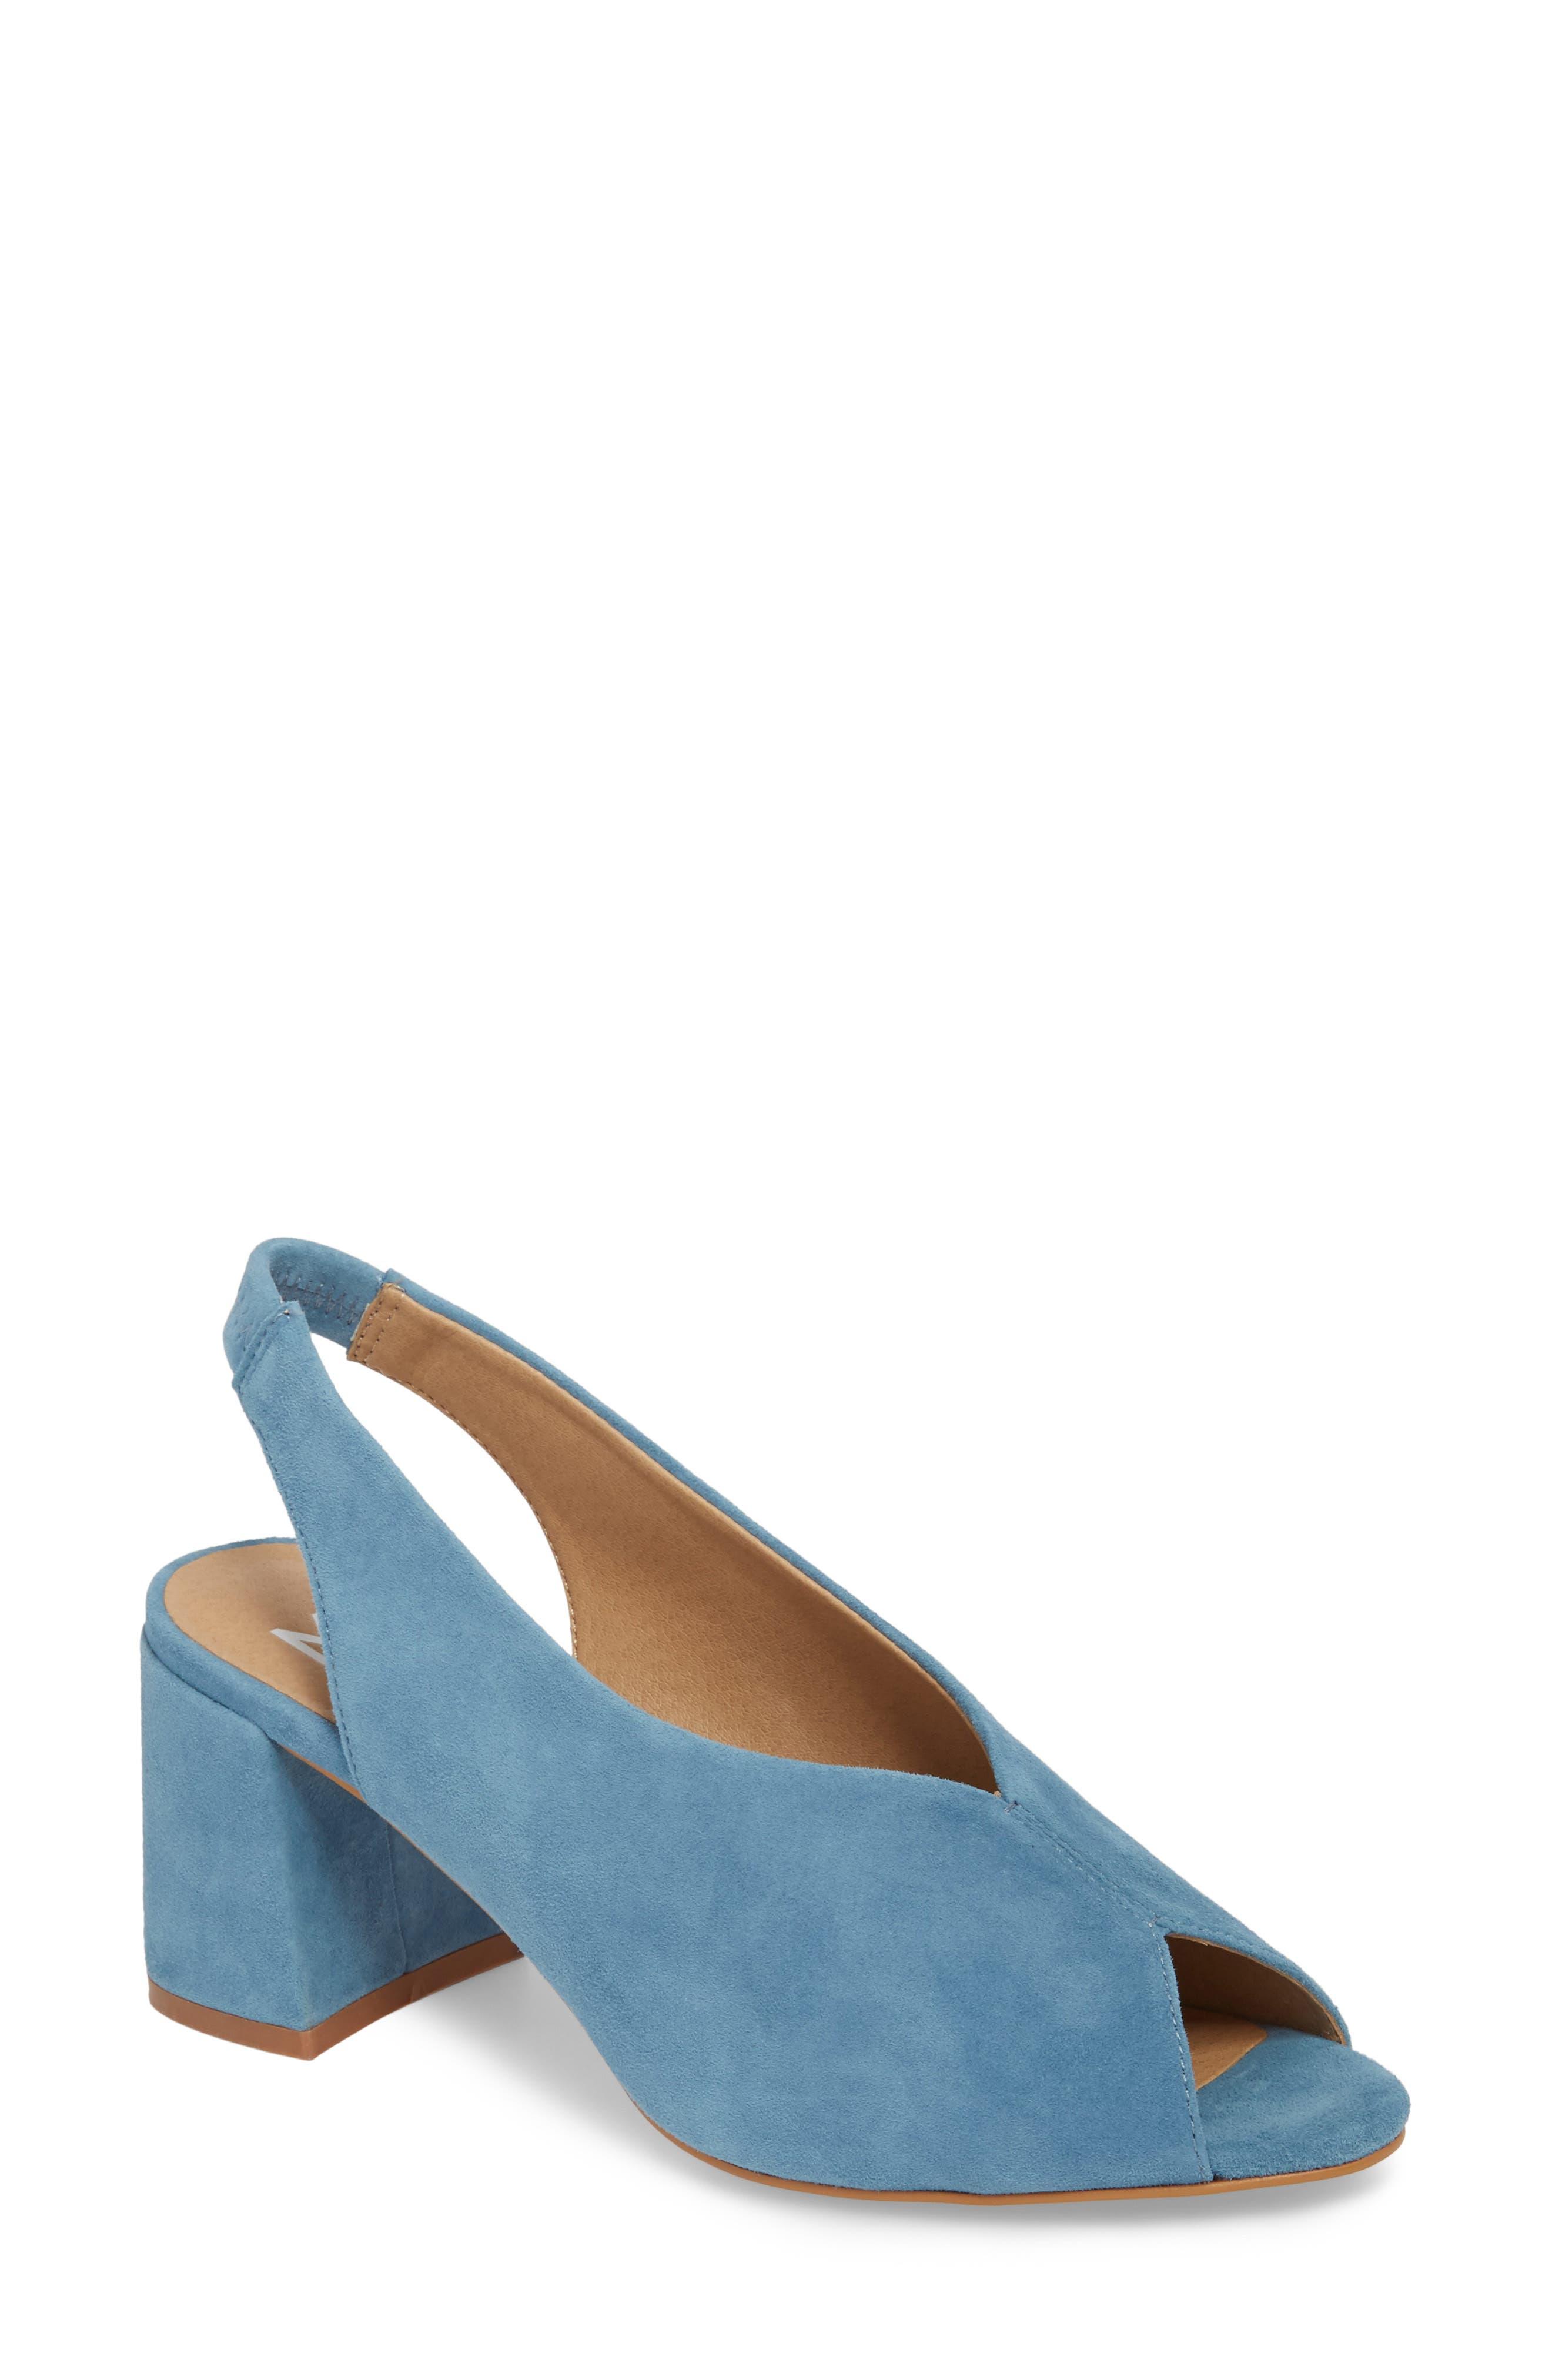 M4D3 Safi Slingback Sandal,                         Main,                         color, AEGEAN SUEDE